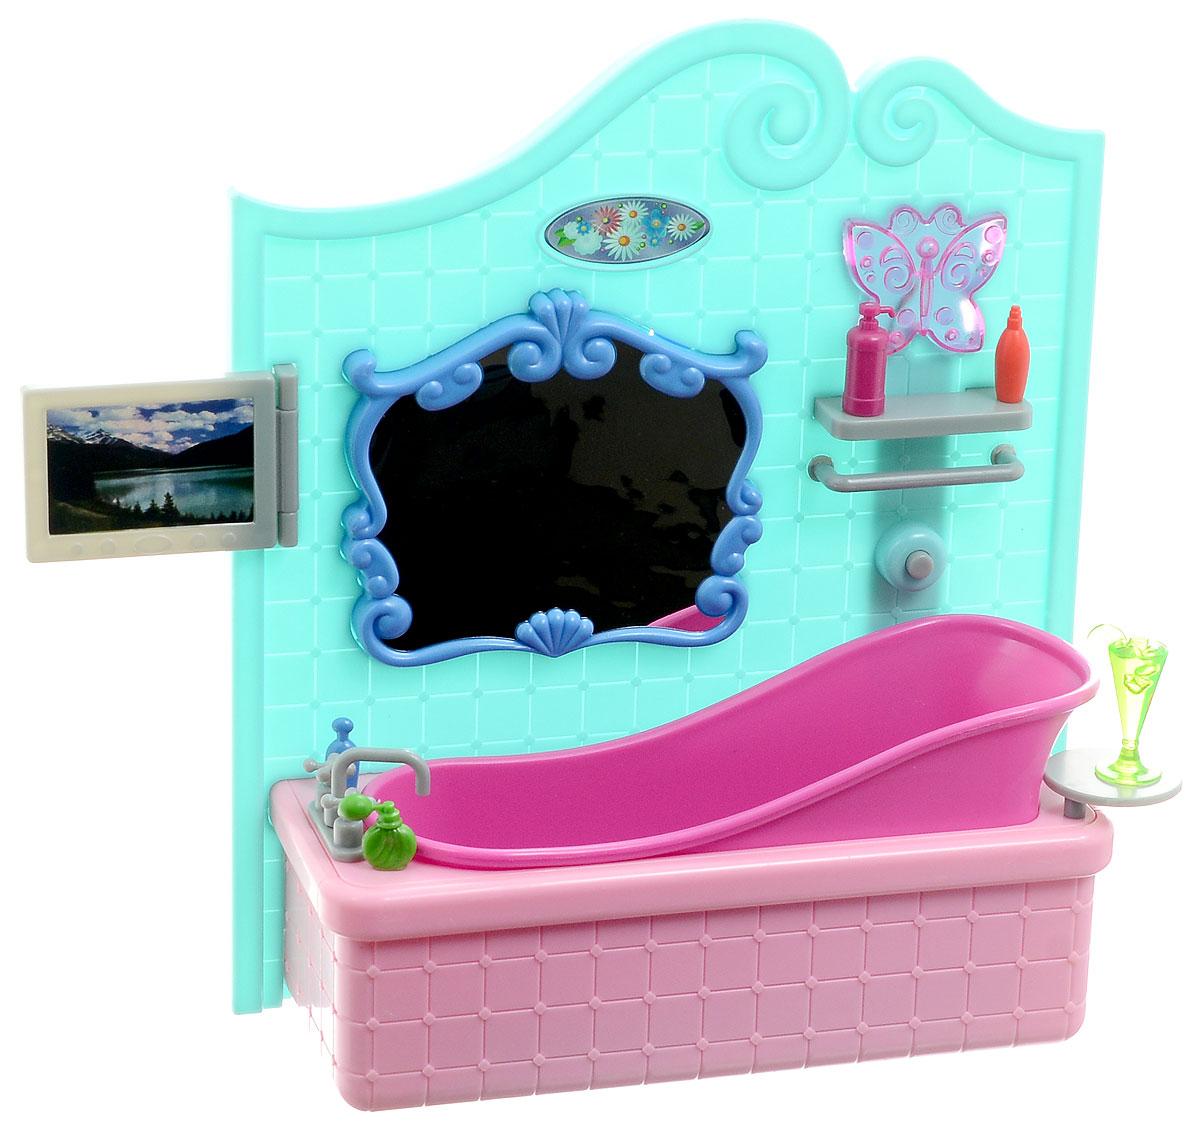 1TOY Набор мебели для кукол Ванная комната с телевизором Красотка красотка набор мебели для кукол гостиная с телевизором т52114 1toy